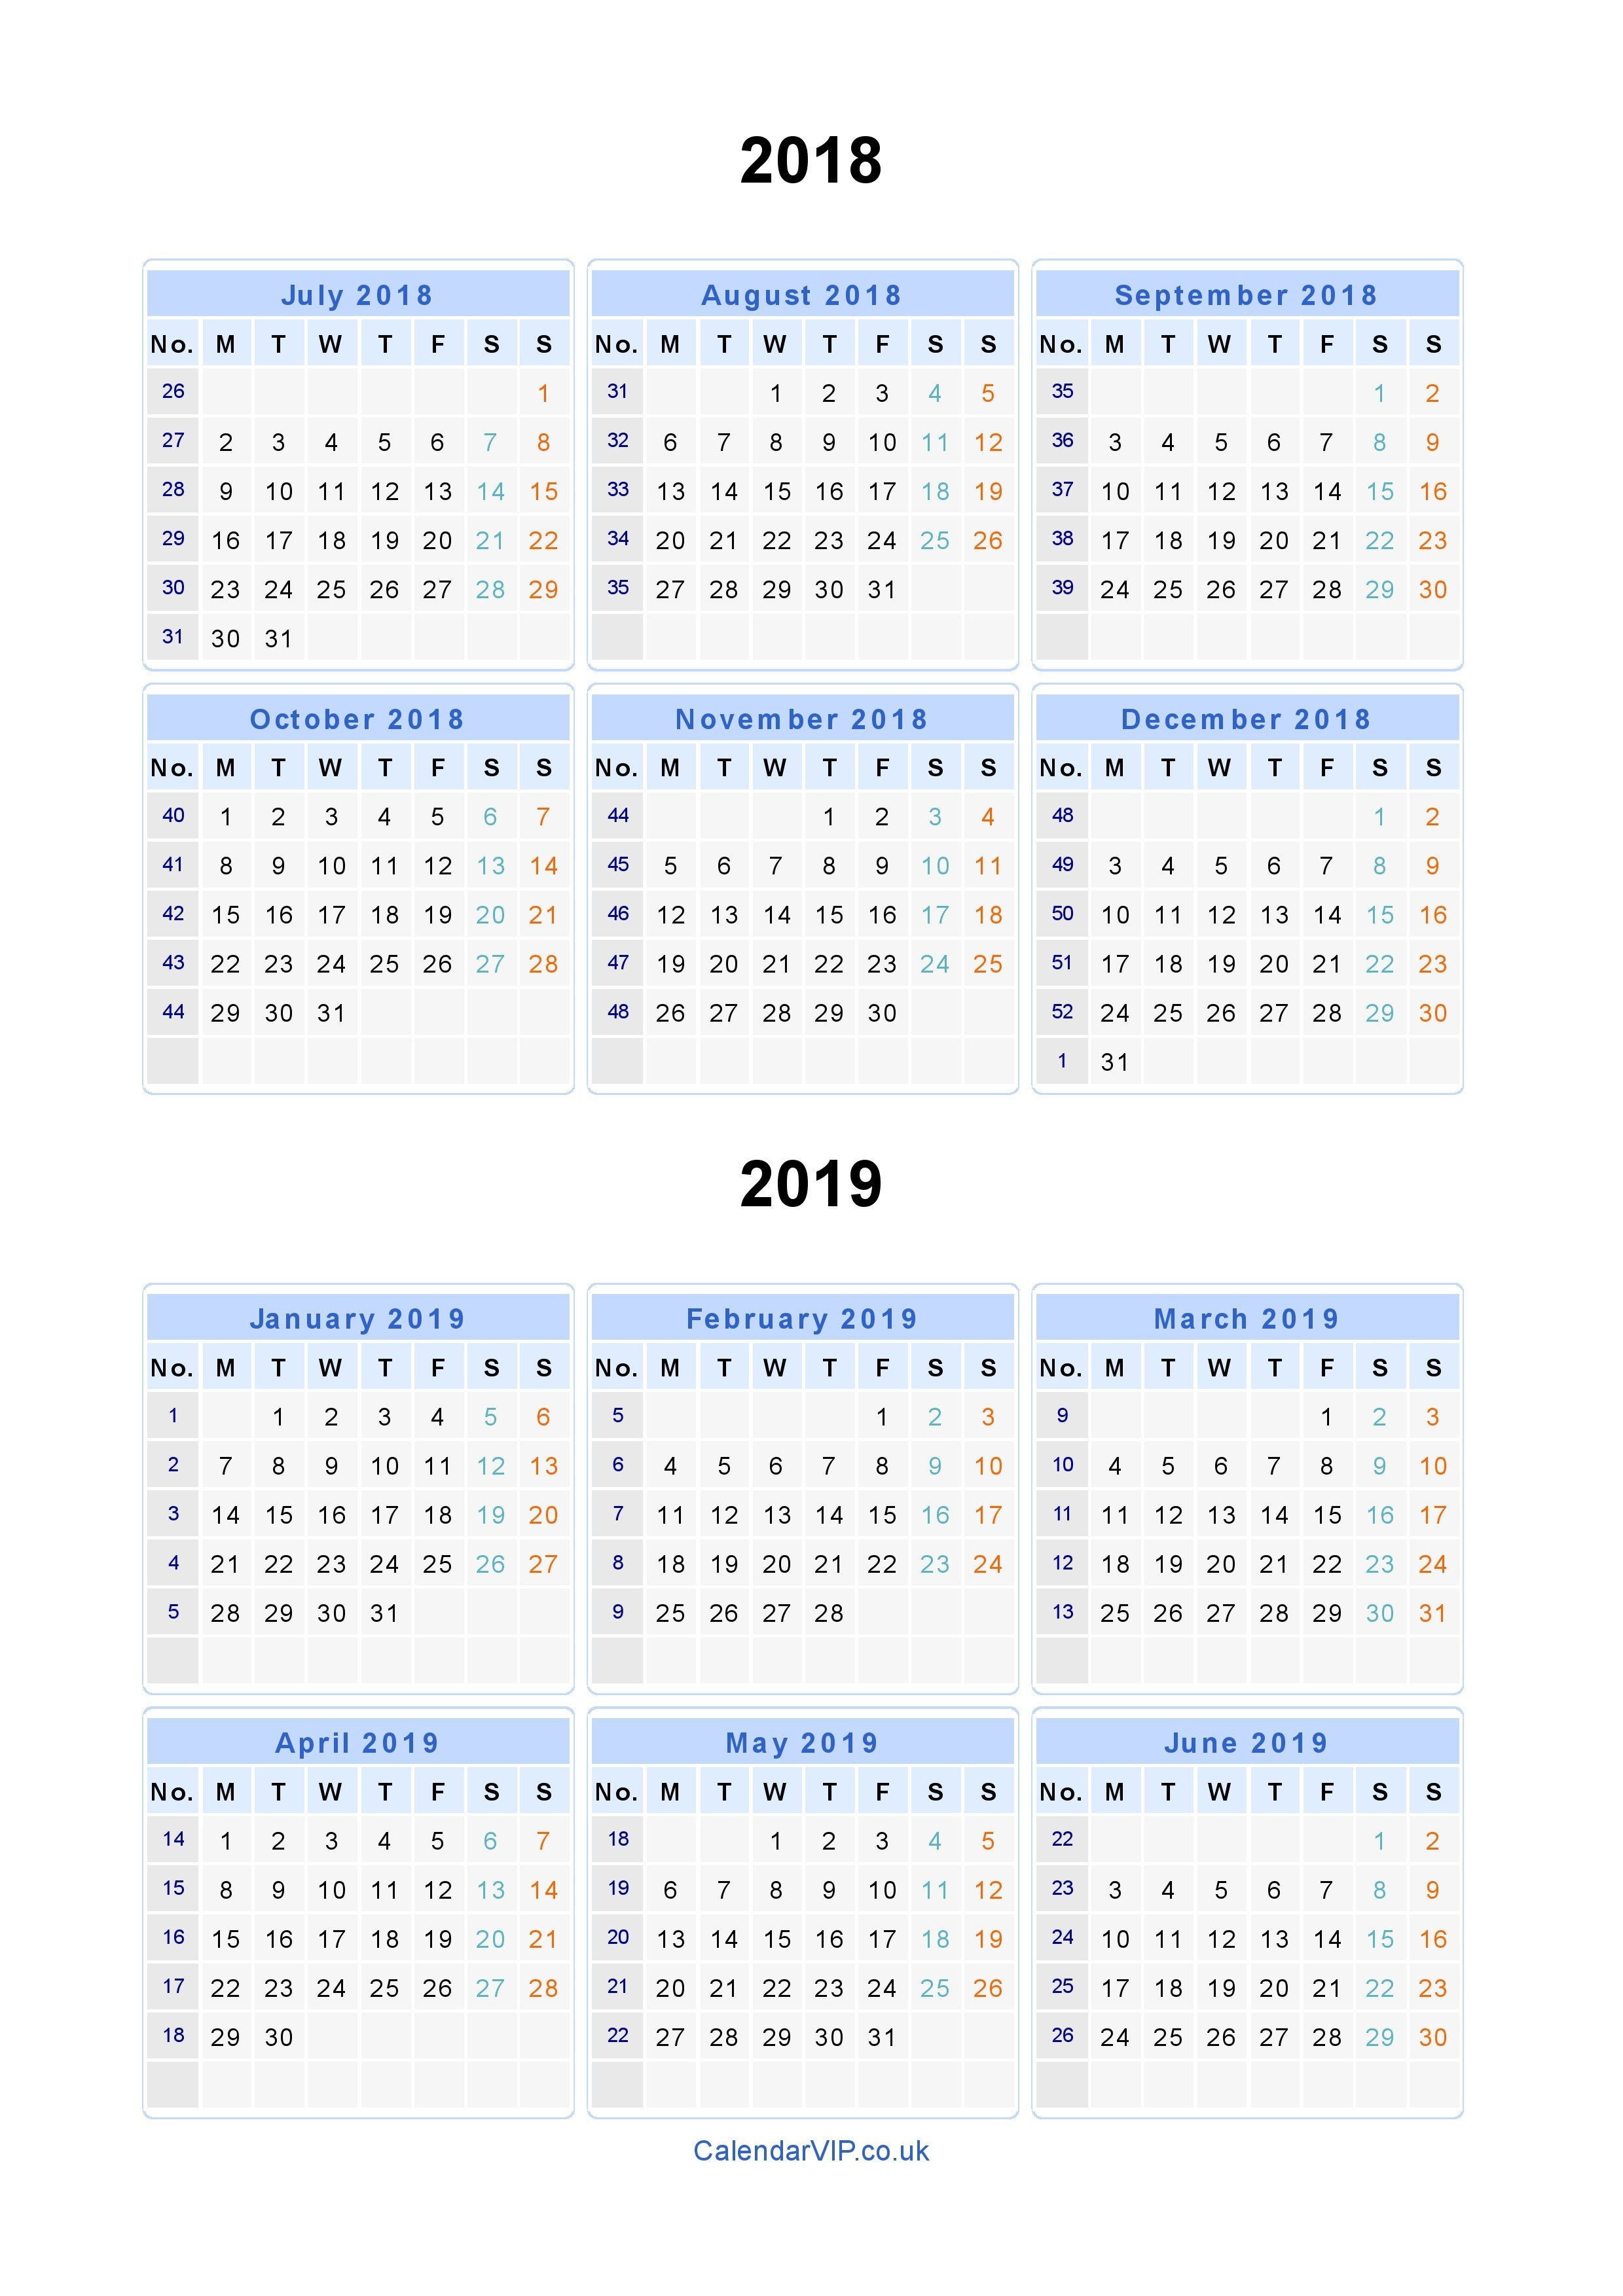 Split Year Calendars 2018 2019 - Calendar From July 2018 To June 2019 4-5-4 Calendar 2019